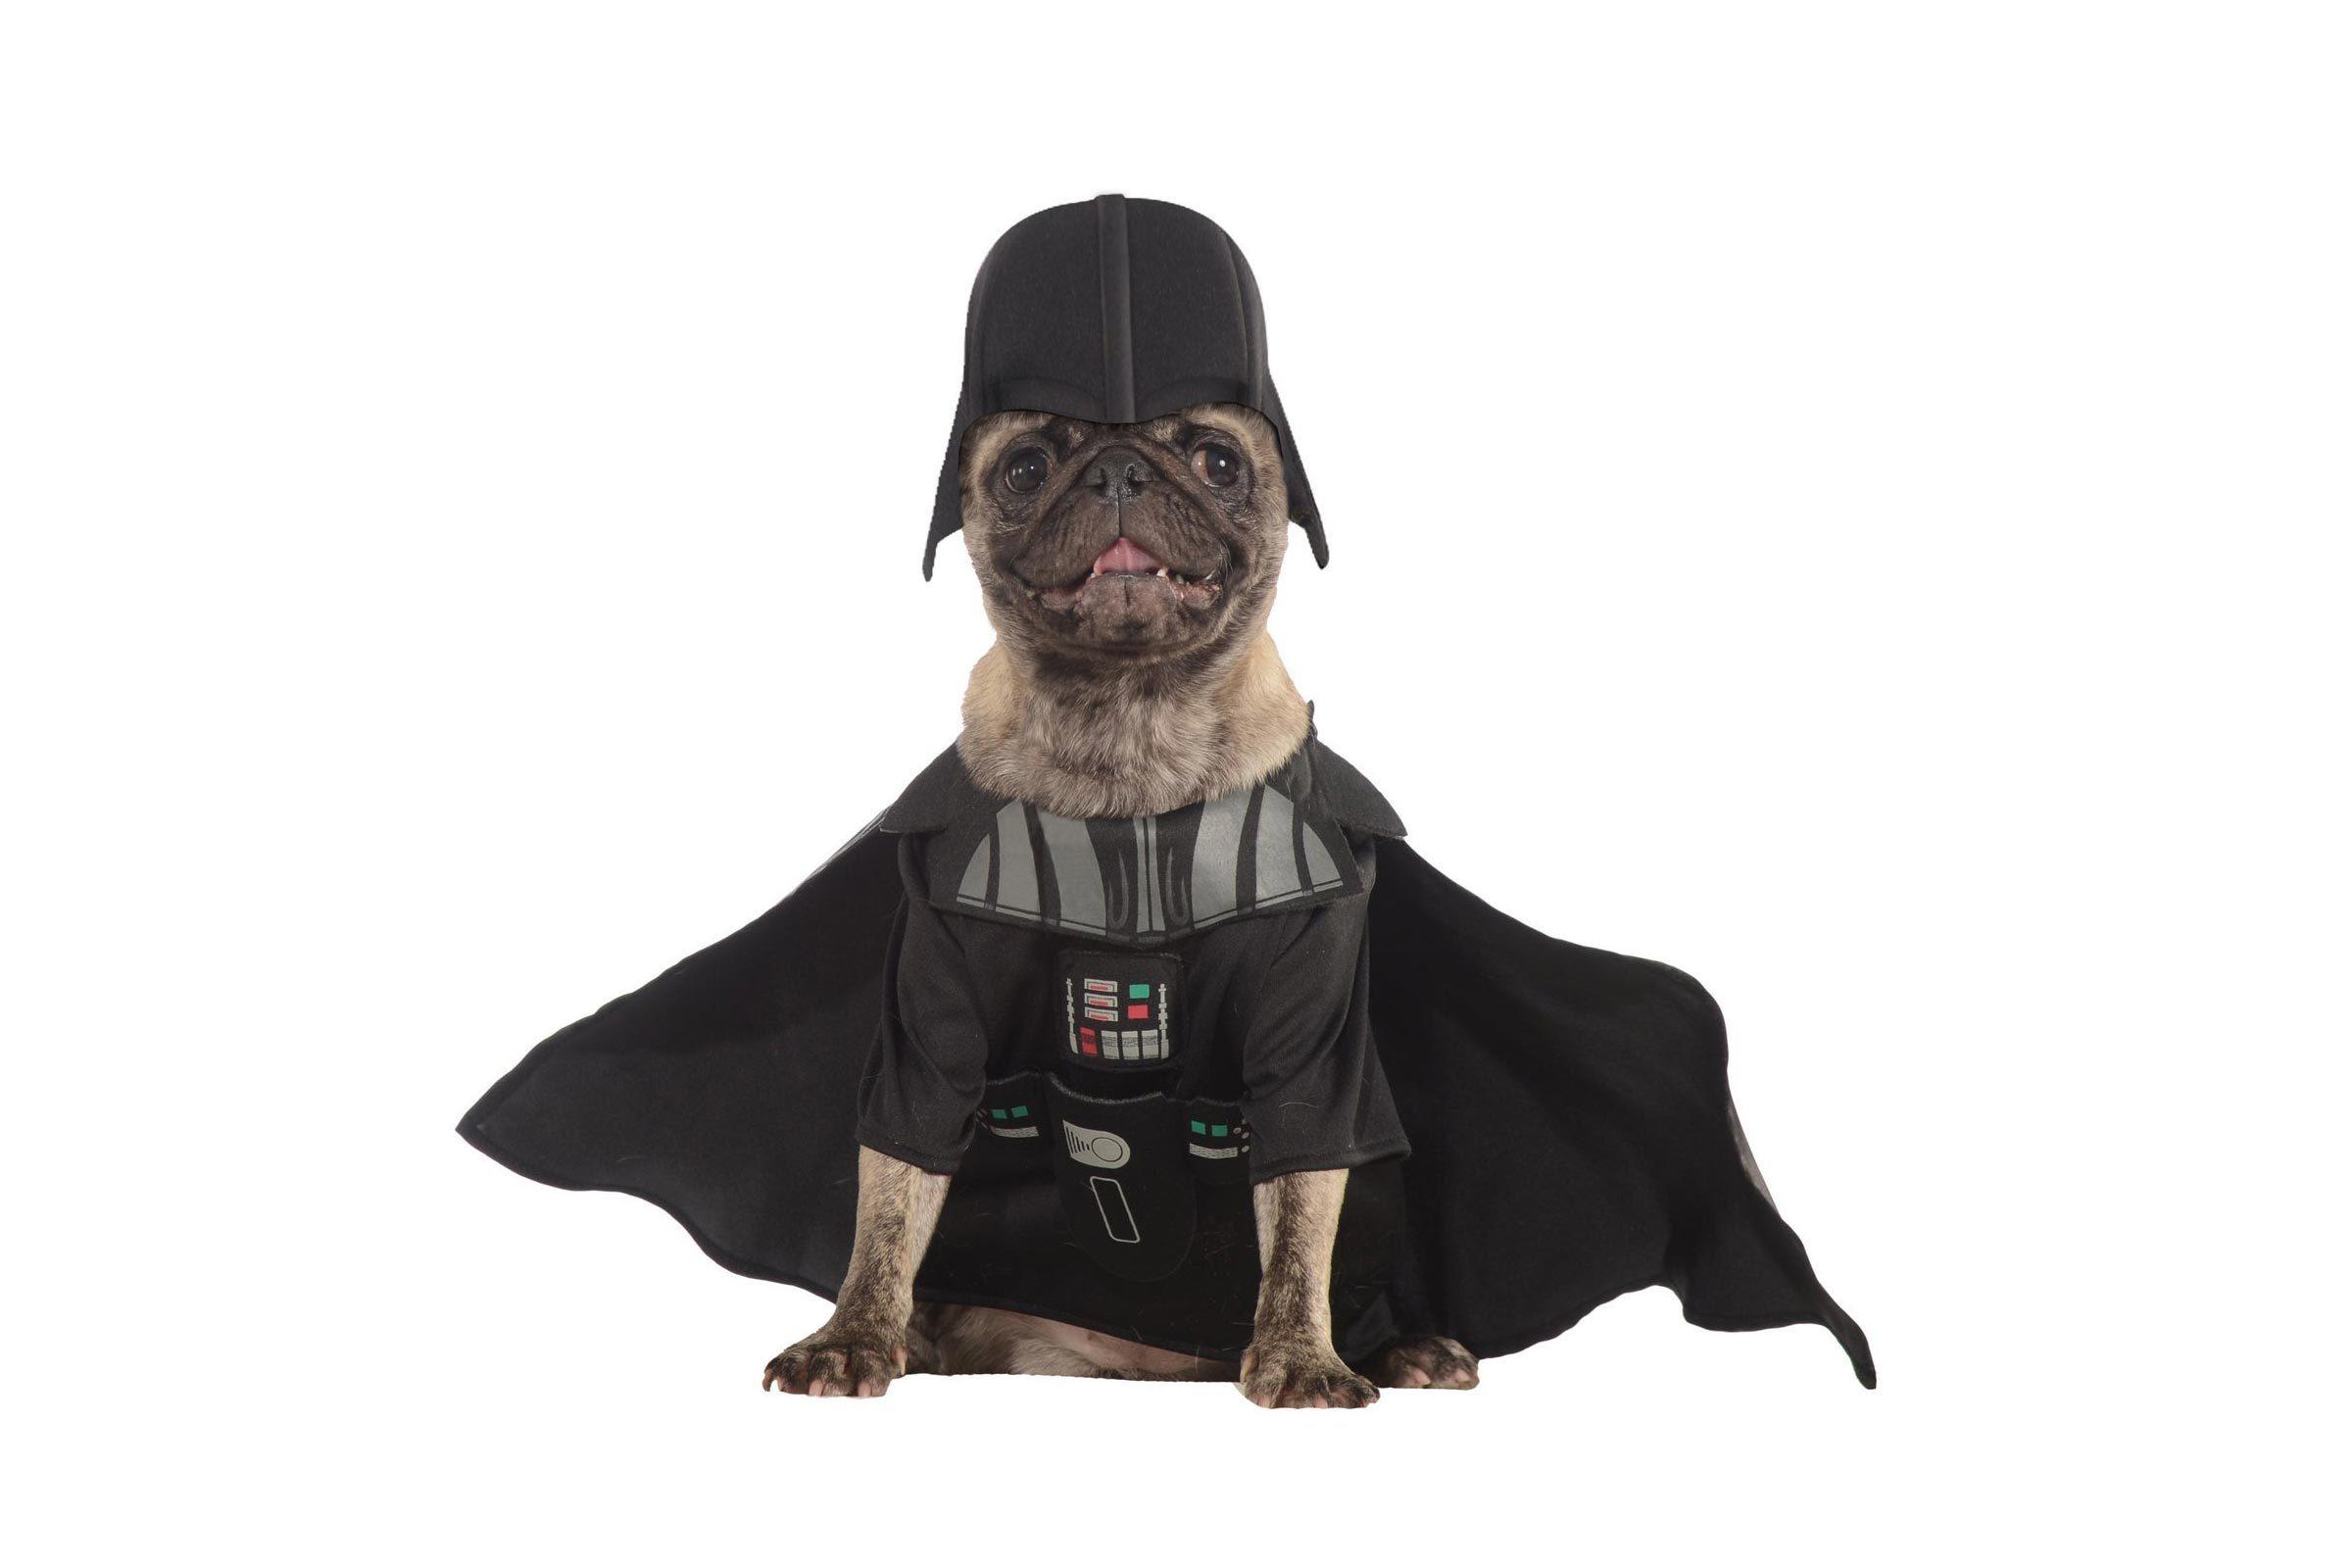 via amazon.com  sc 1 st  Readeru0027s Digest & Dog Halloween Costumes: Best Halloween Costumes for Dogs | Readeru0027s ...